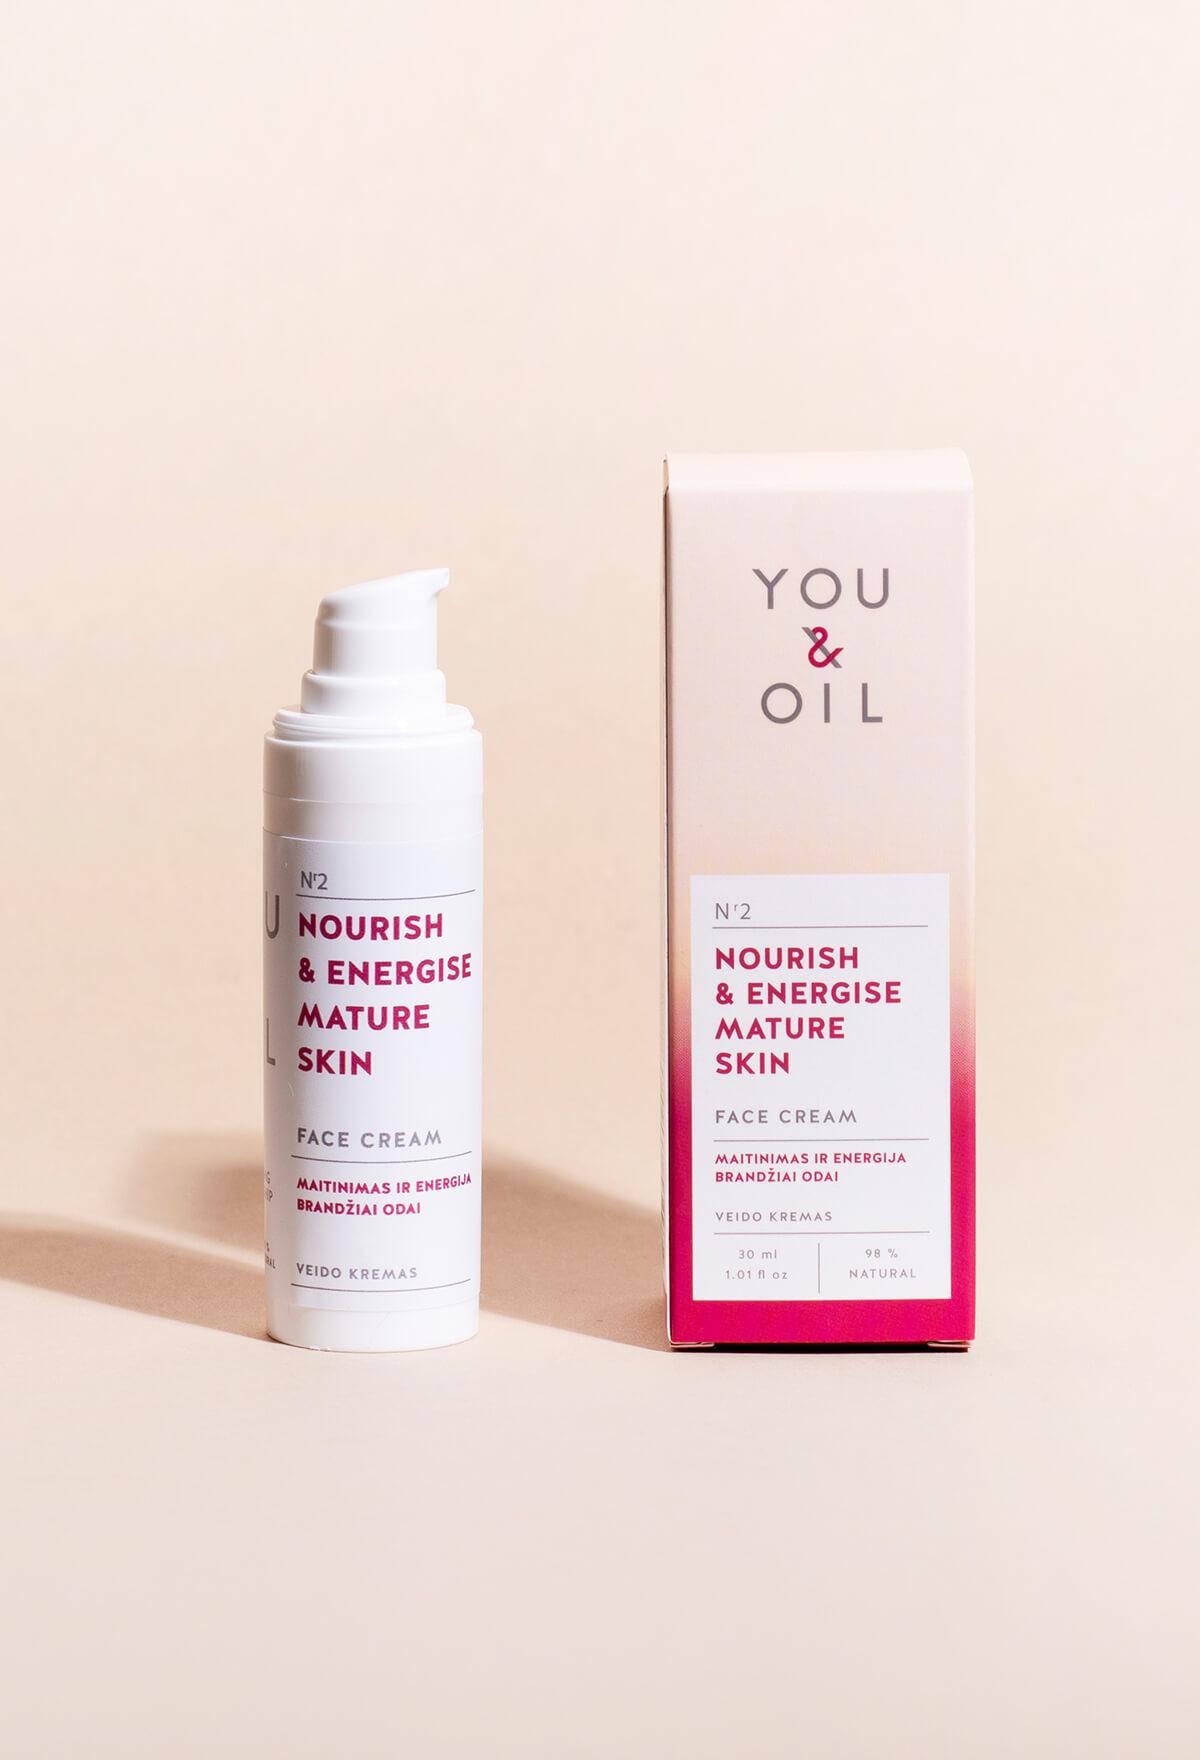 1290Nourish & Energise Mature Skin